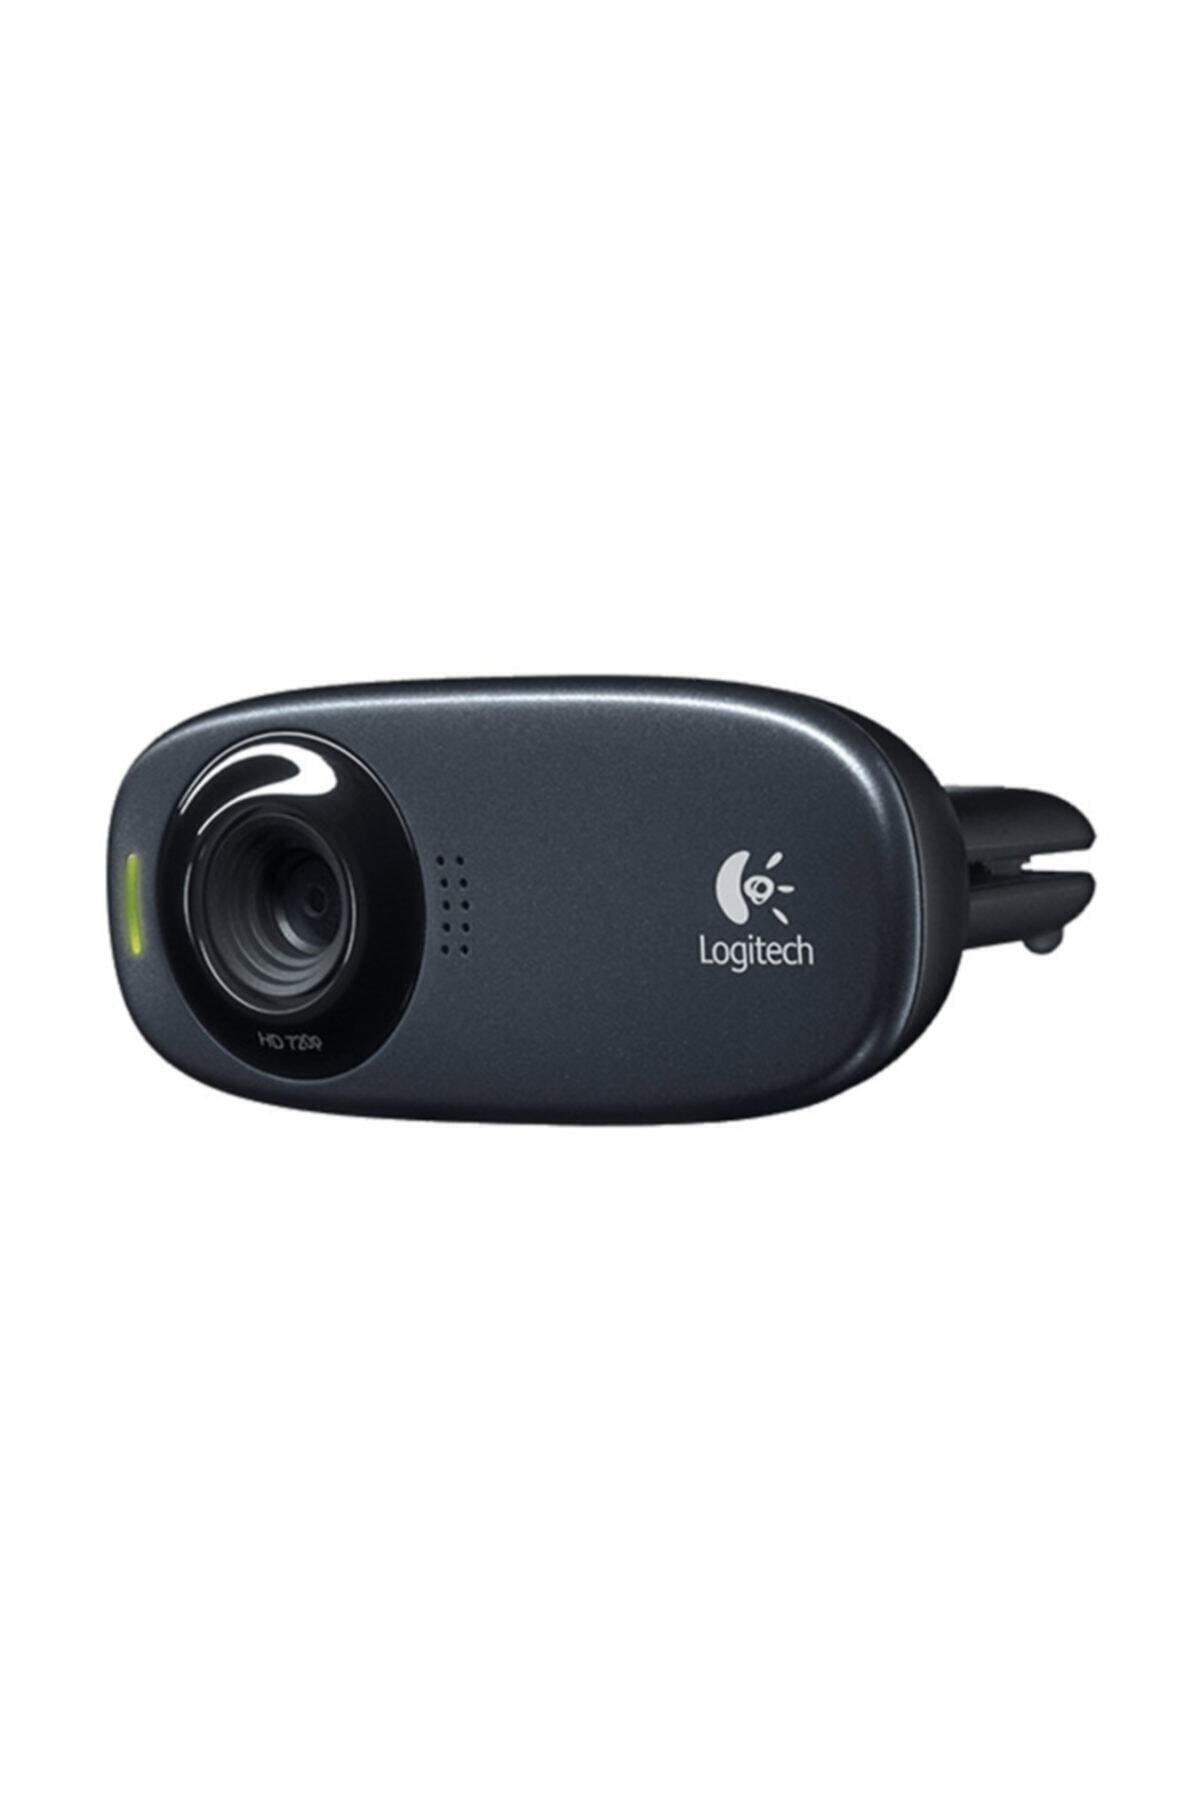 logitech 960-001065 C310 Hd 720p Dahili Mikrofon Usb Webcam 2